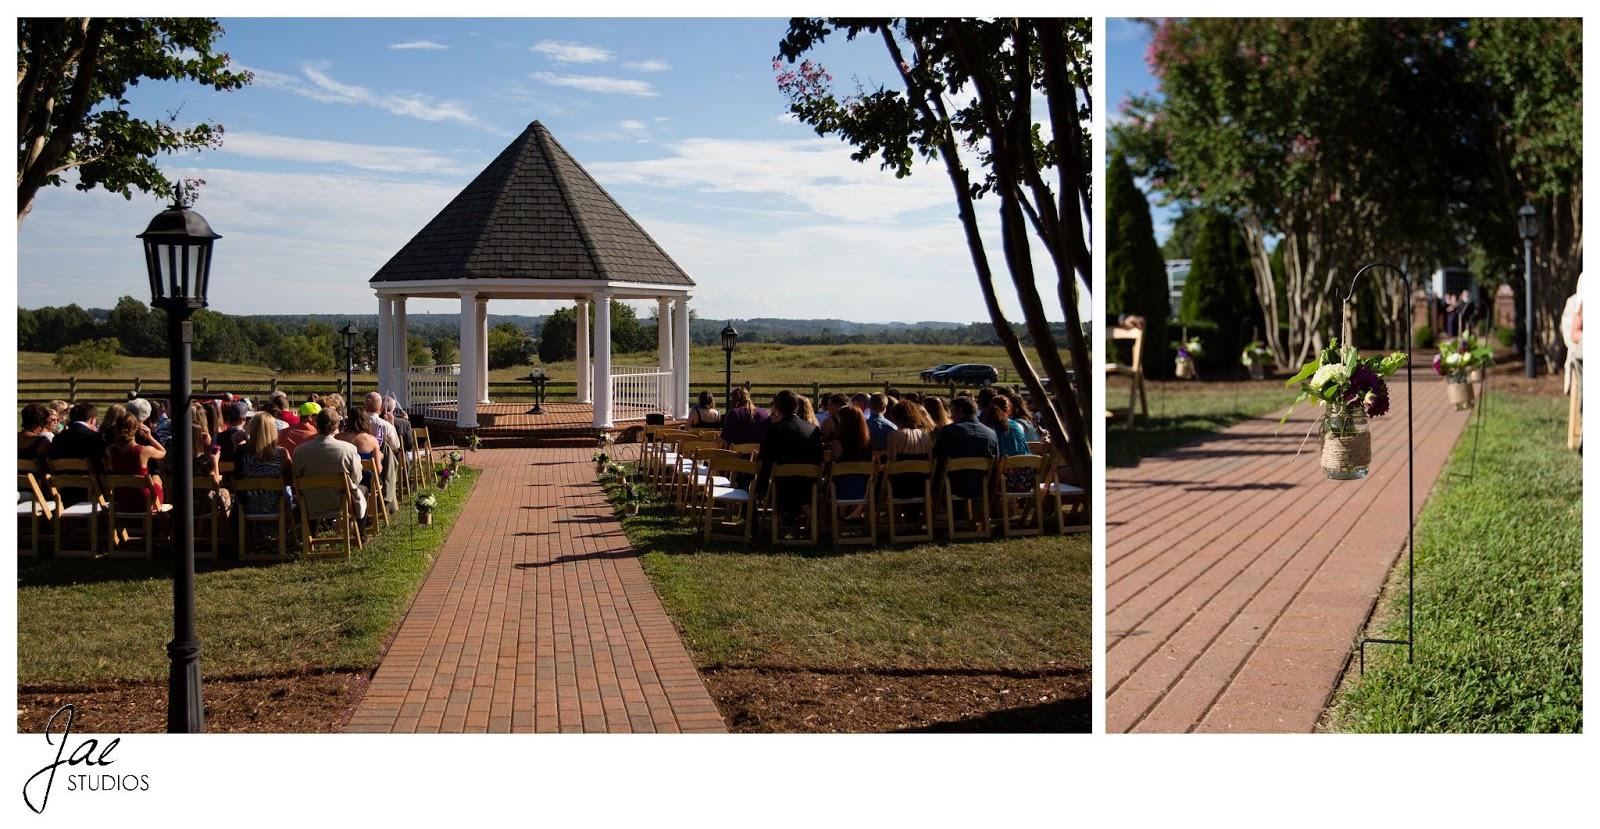 Jonathan and Julie, Bird cage, West Manor Estate, Wedding, Lynchburg, Virginia, Jae Studios, ceremony, scenery, gazebo, guests, flowers, purple